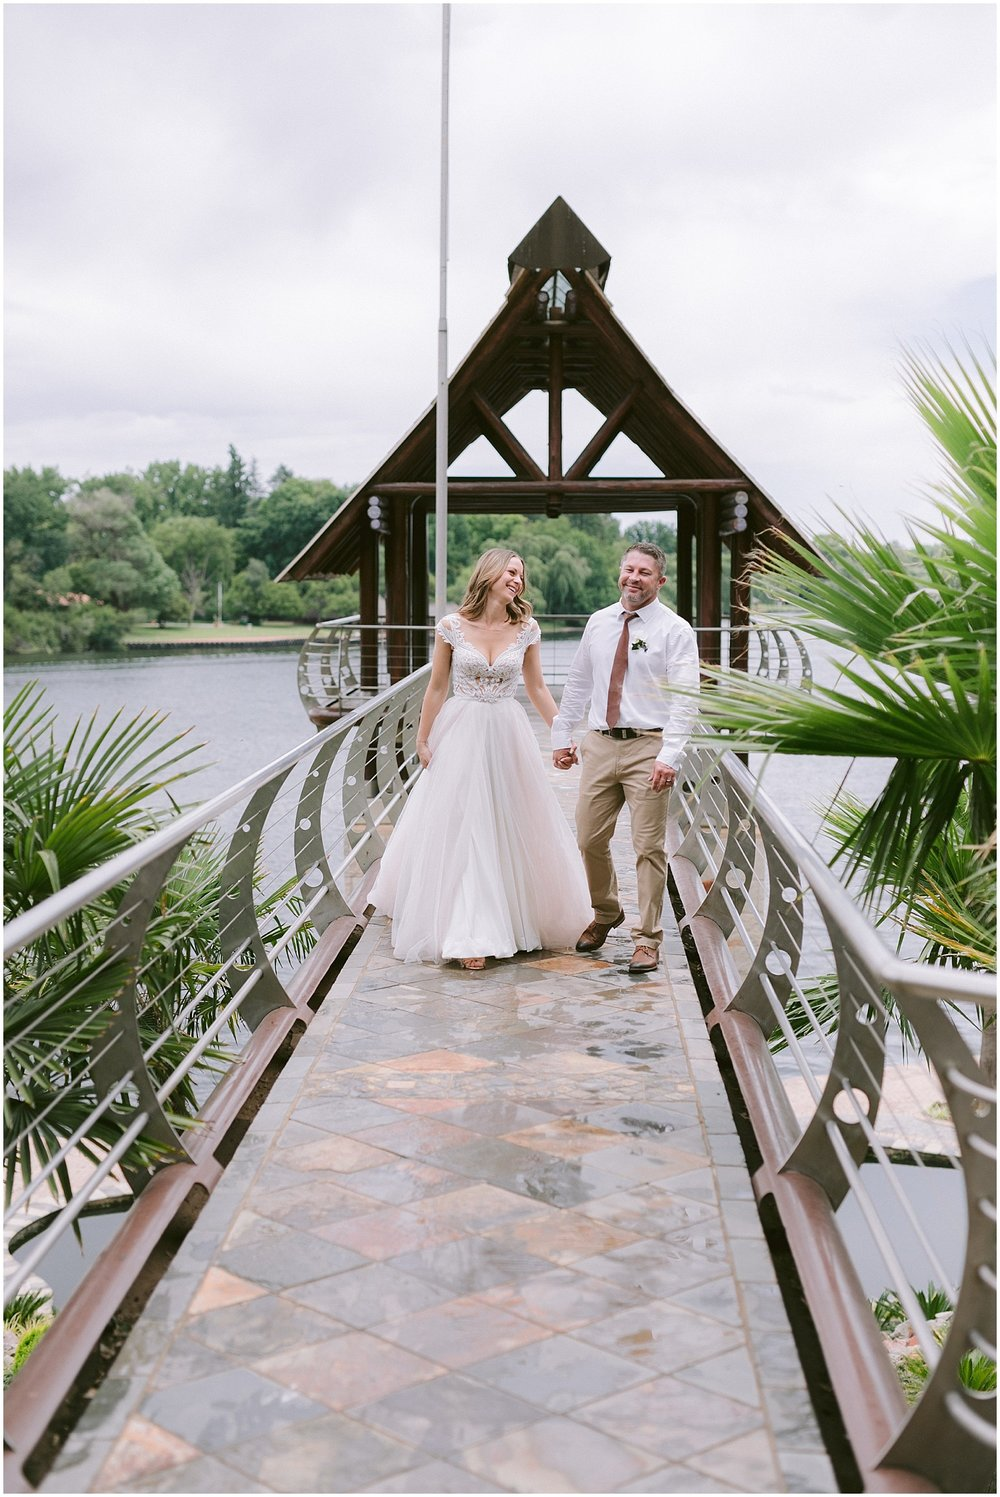 duckpoint_wedding_rolene_photography_0058.jpg